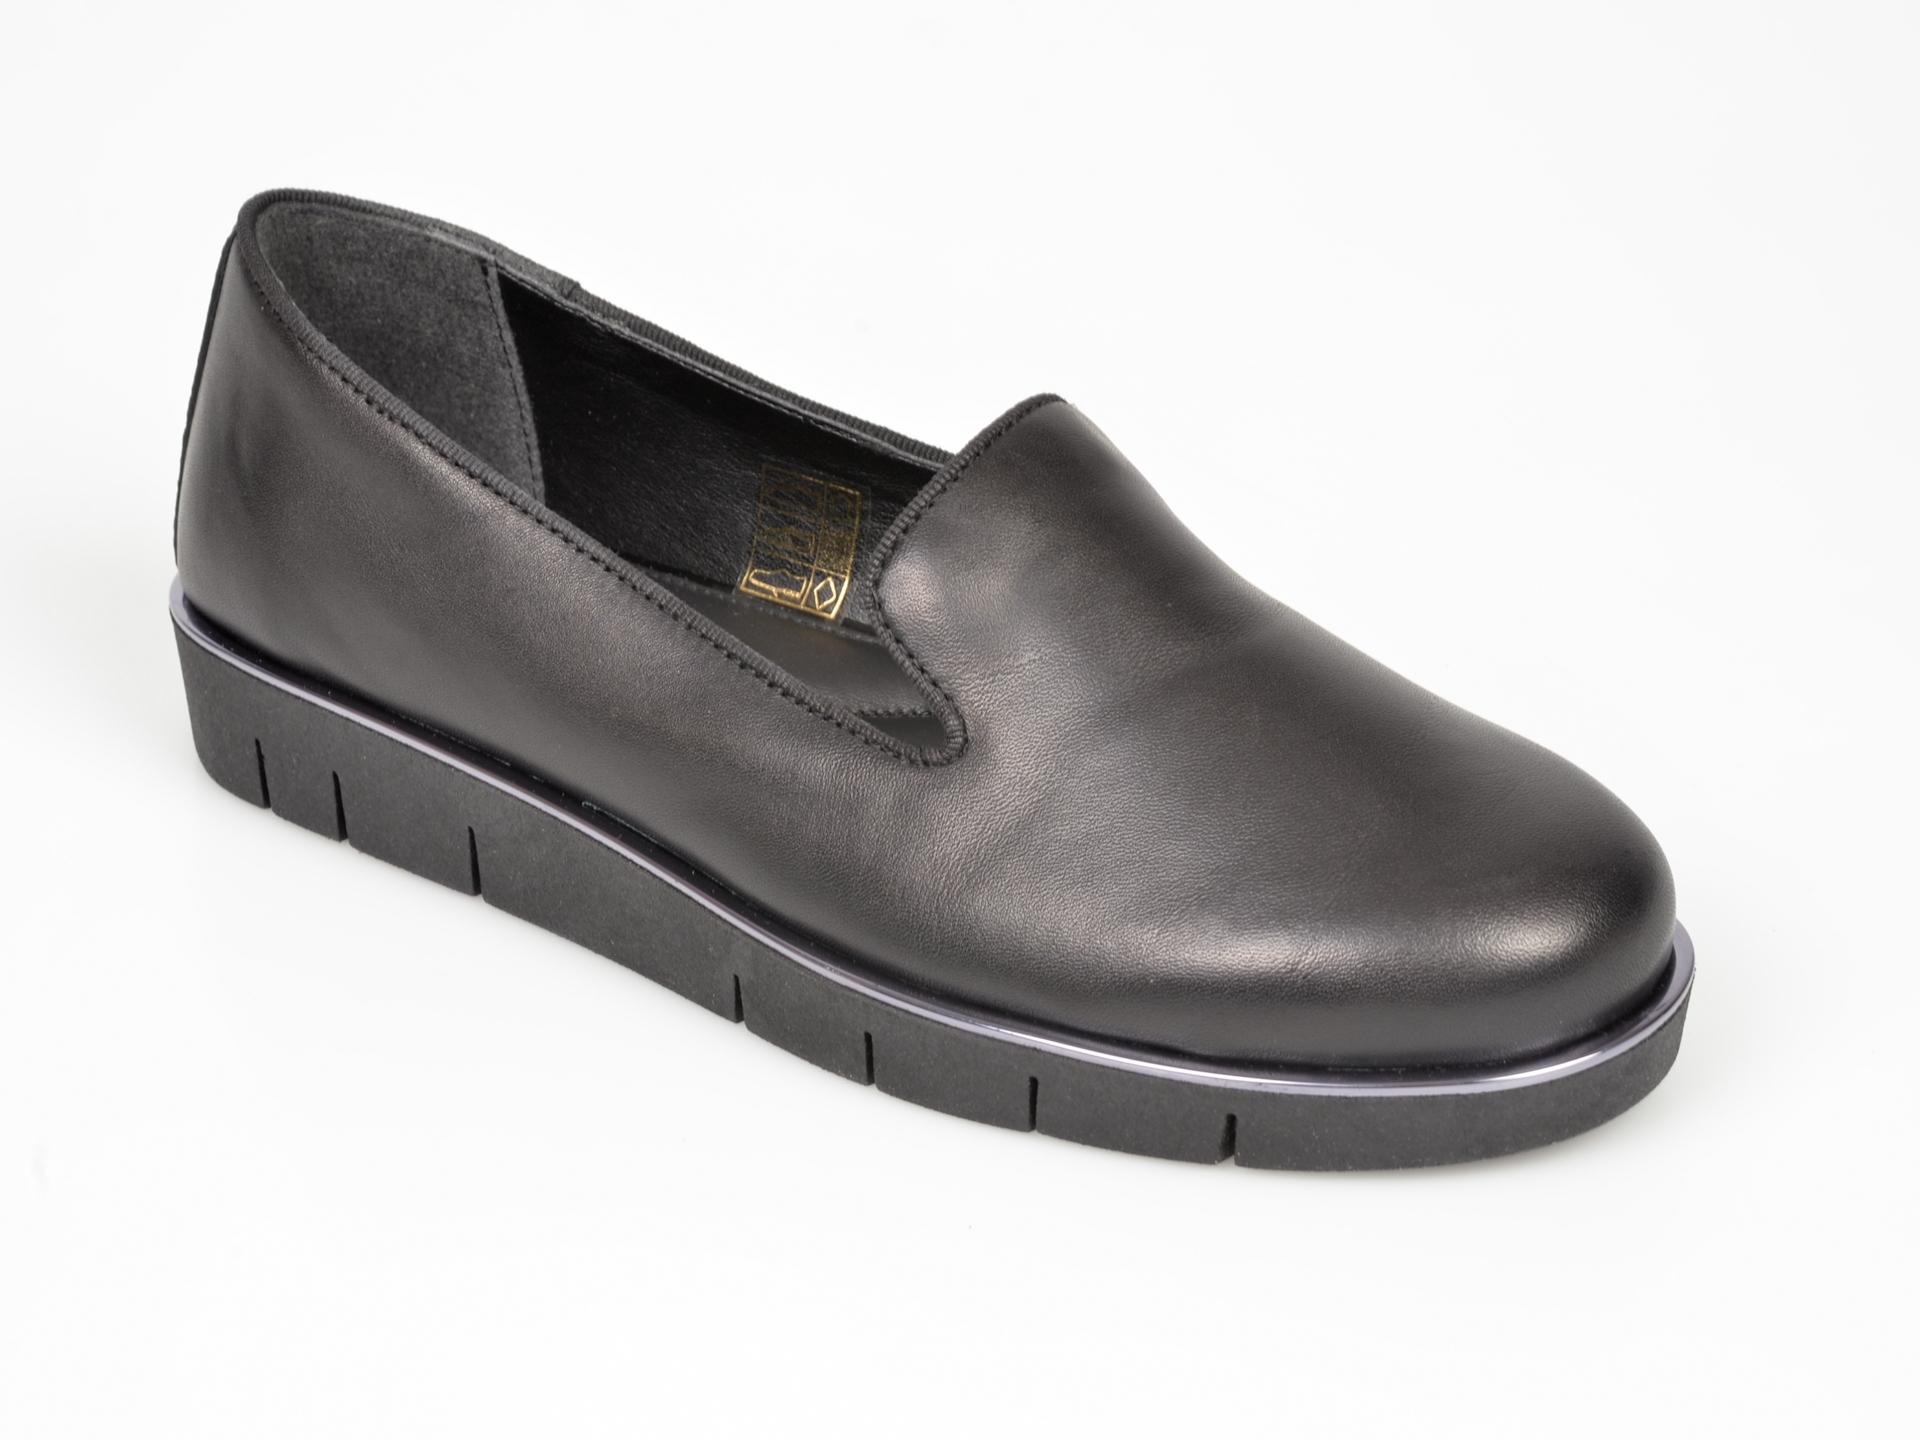 Pantofi The FLEXX negri, Etna, din piele naturala